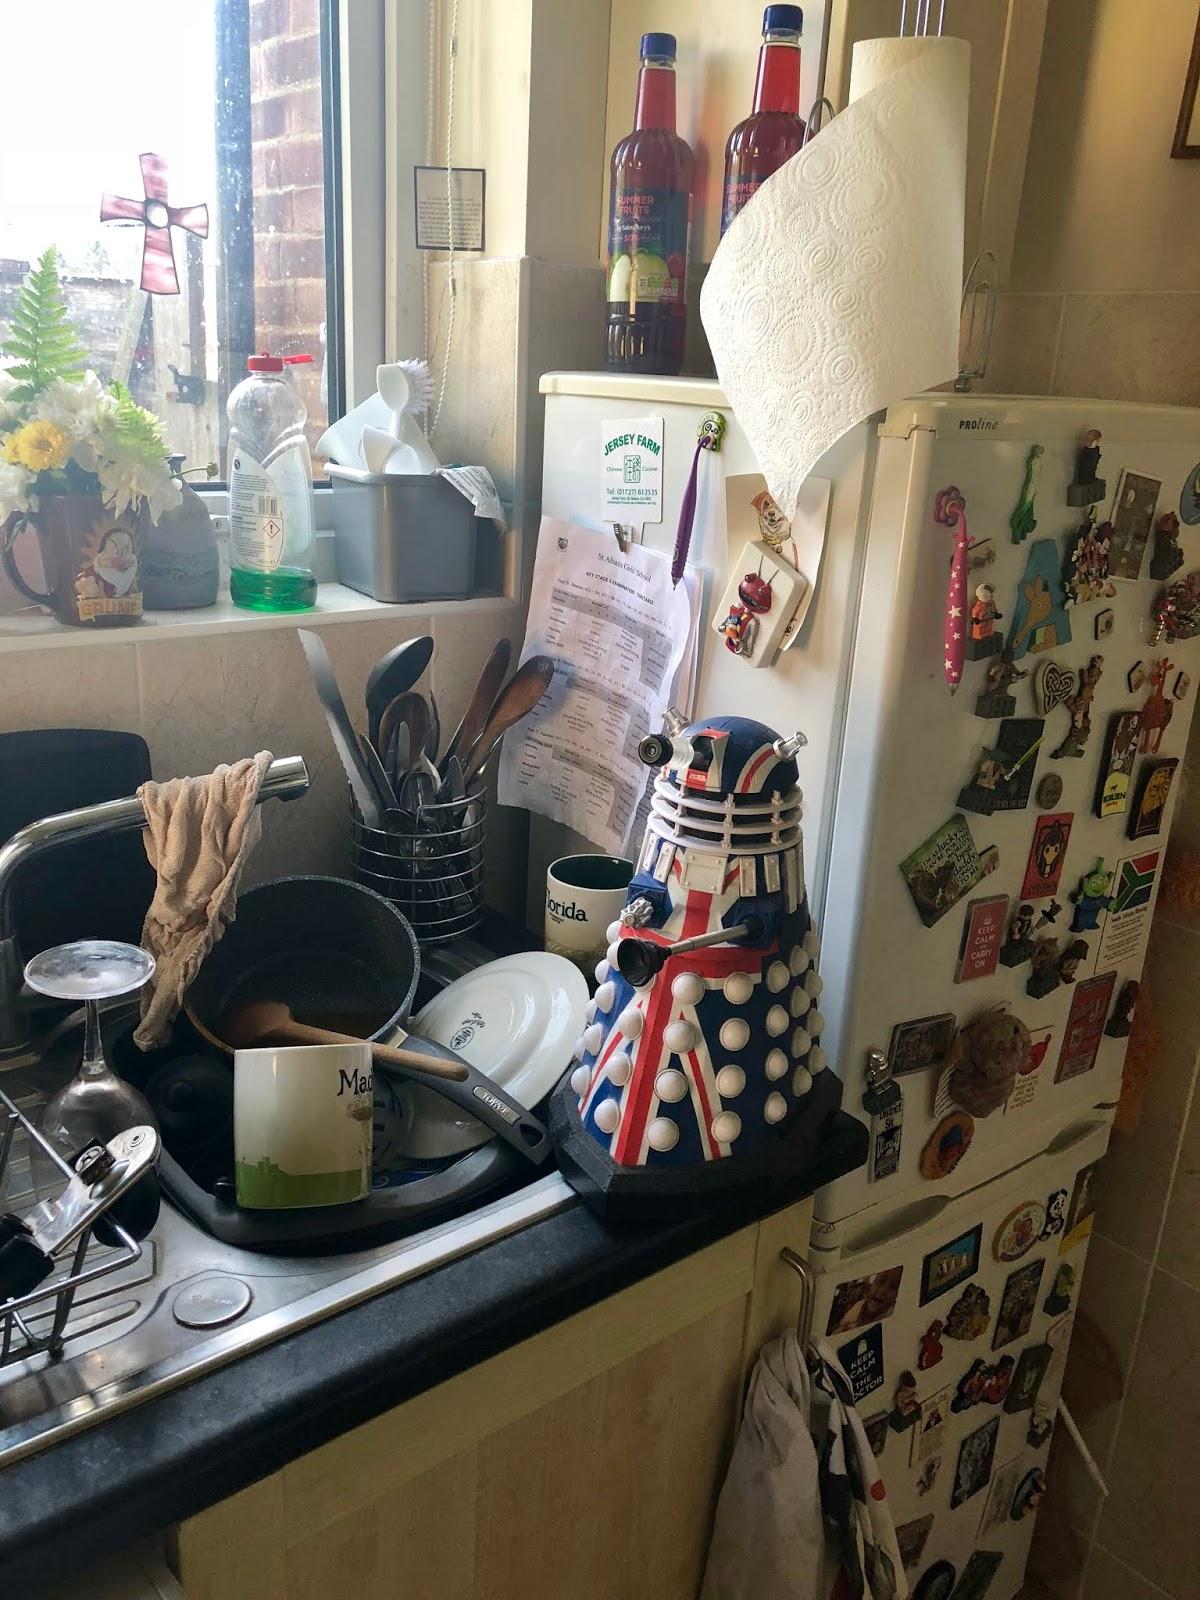 Derek does the washing up